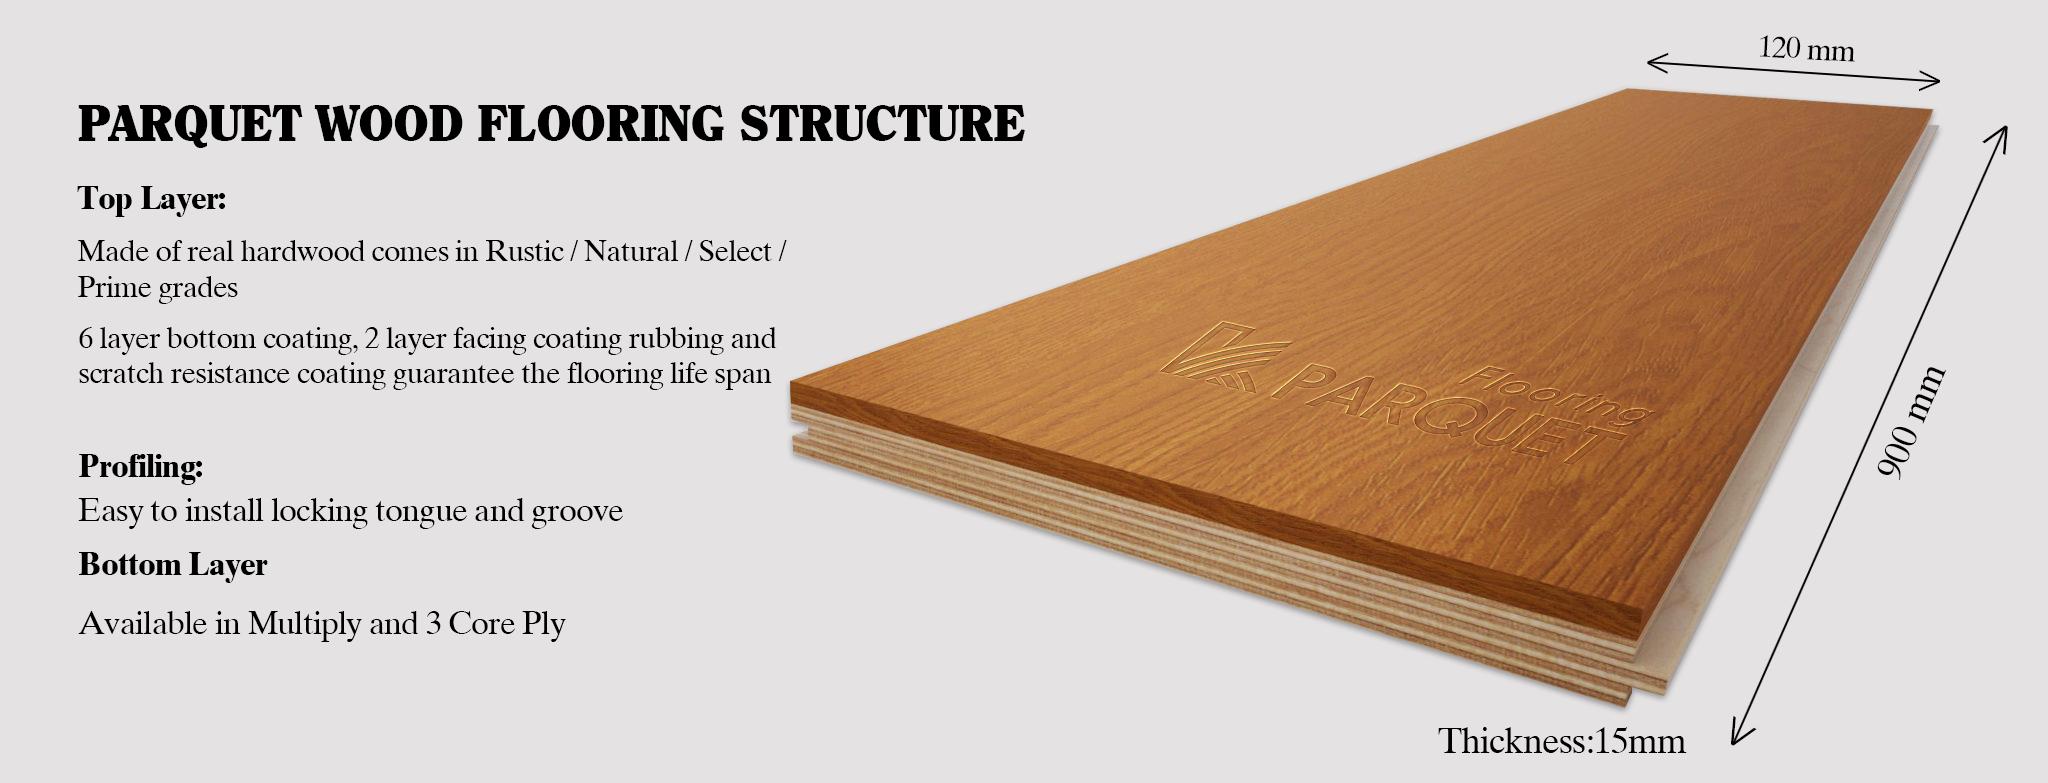 parquet wood flooring structure